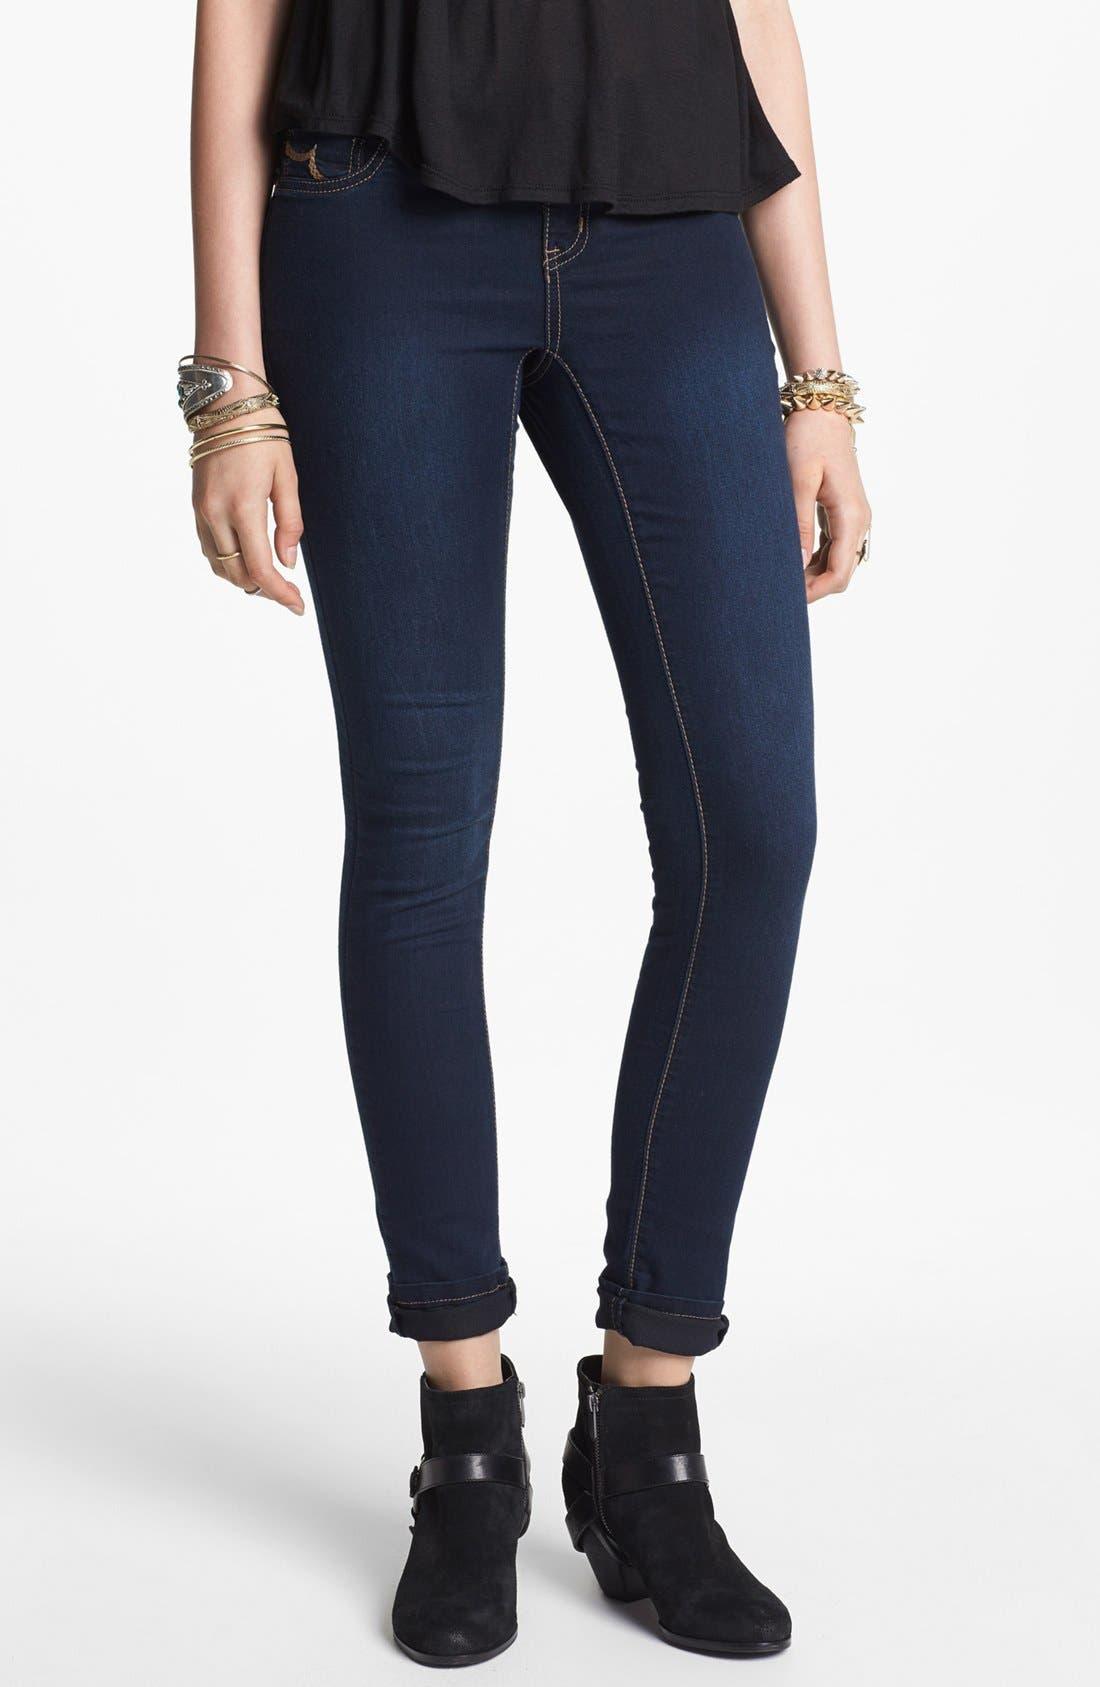 Alternate Image 1 Selected - INSTANT VINTAGE Stretch Denim 'Olivia' Skinny Jeans (Dark) (Juniors)